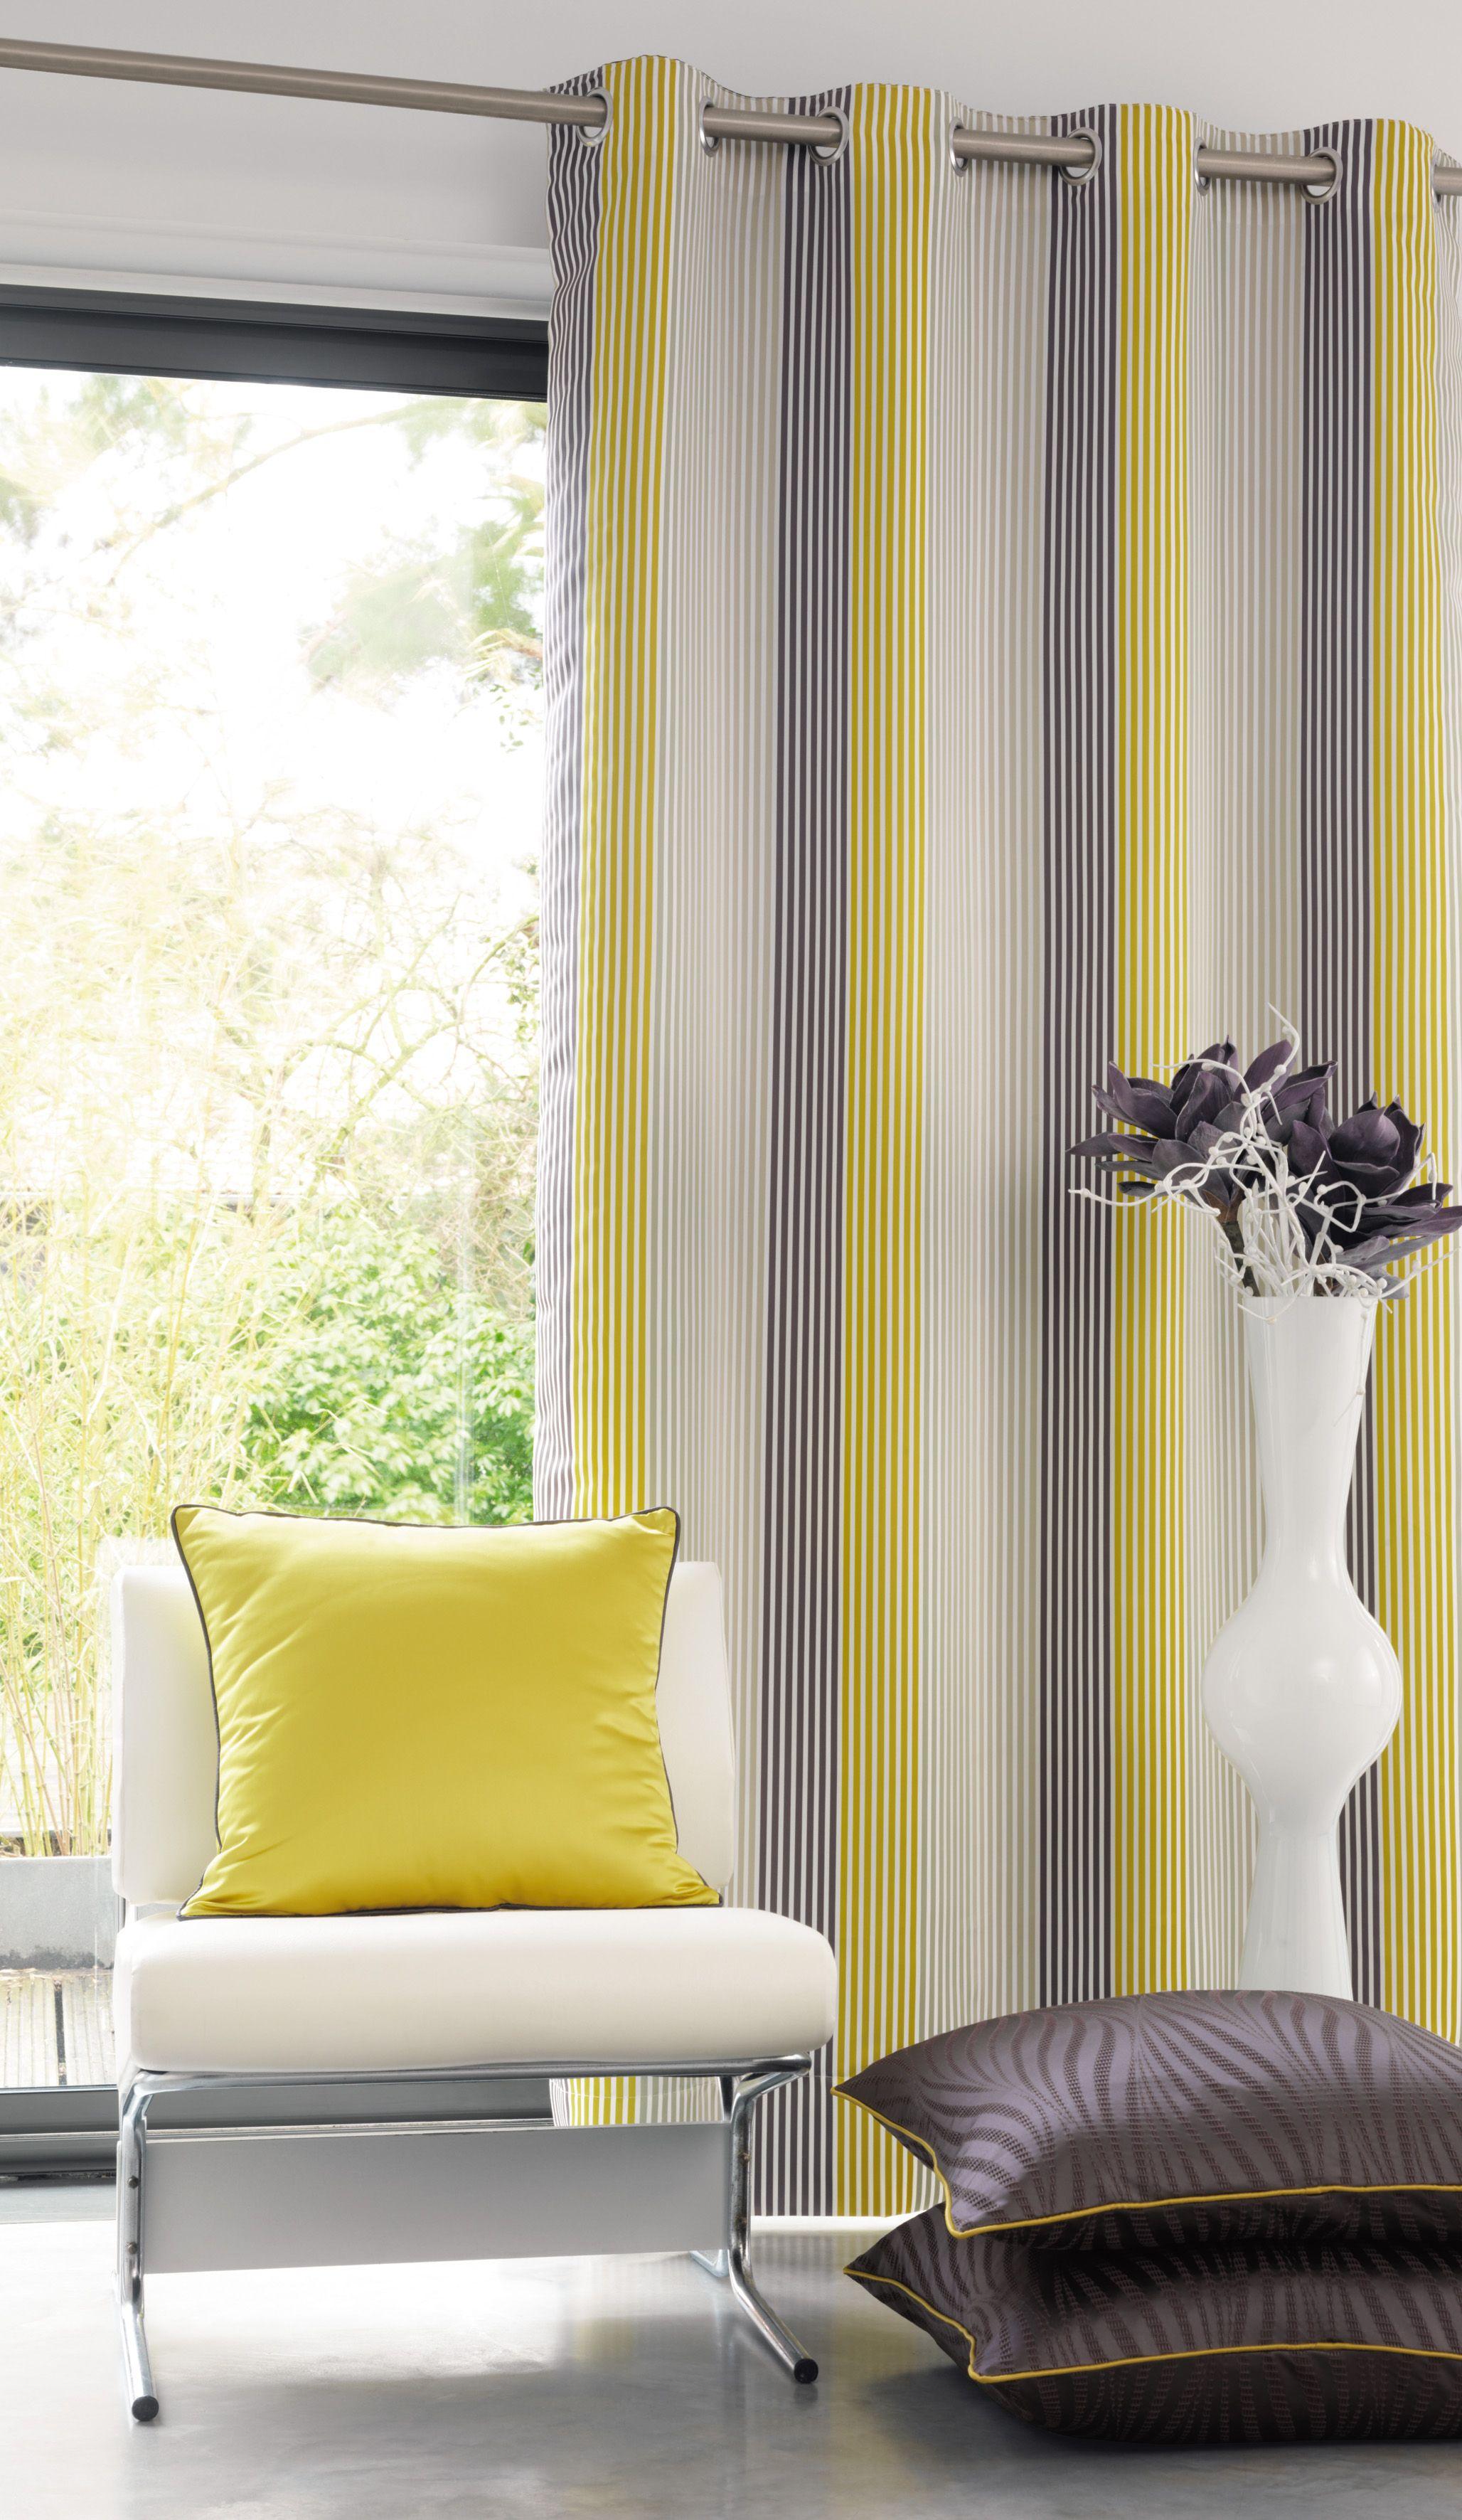 rideau jaune et gris zakelijksportnetwerkoost. Black Bedroom Furniture Sets. Home Design Ideas